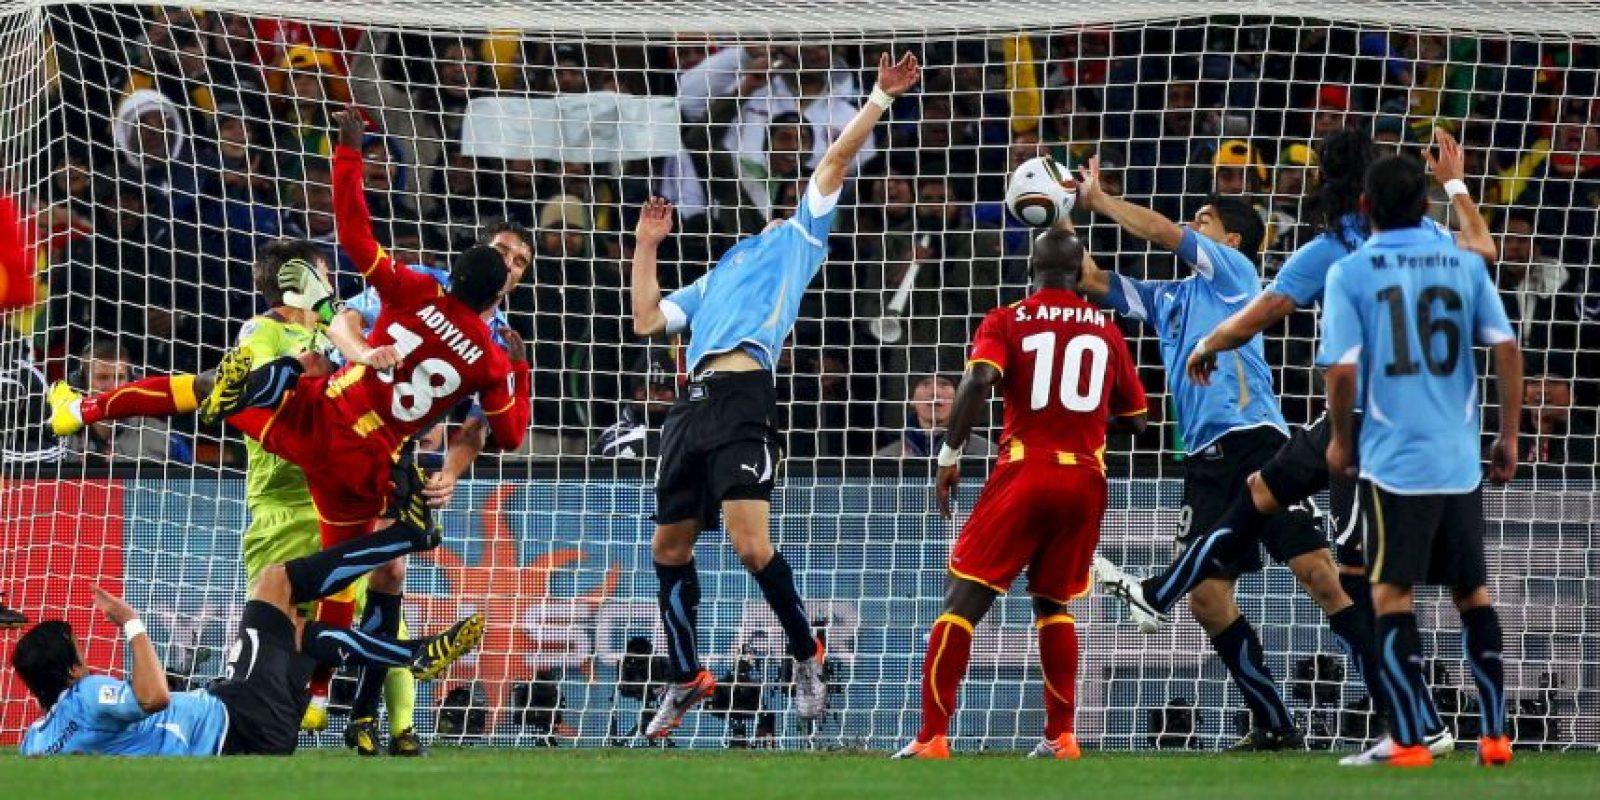 7. La mano de Luis Suárez Foto:Getty Images